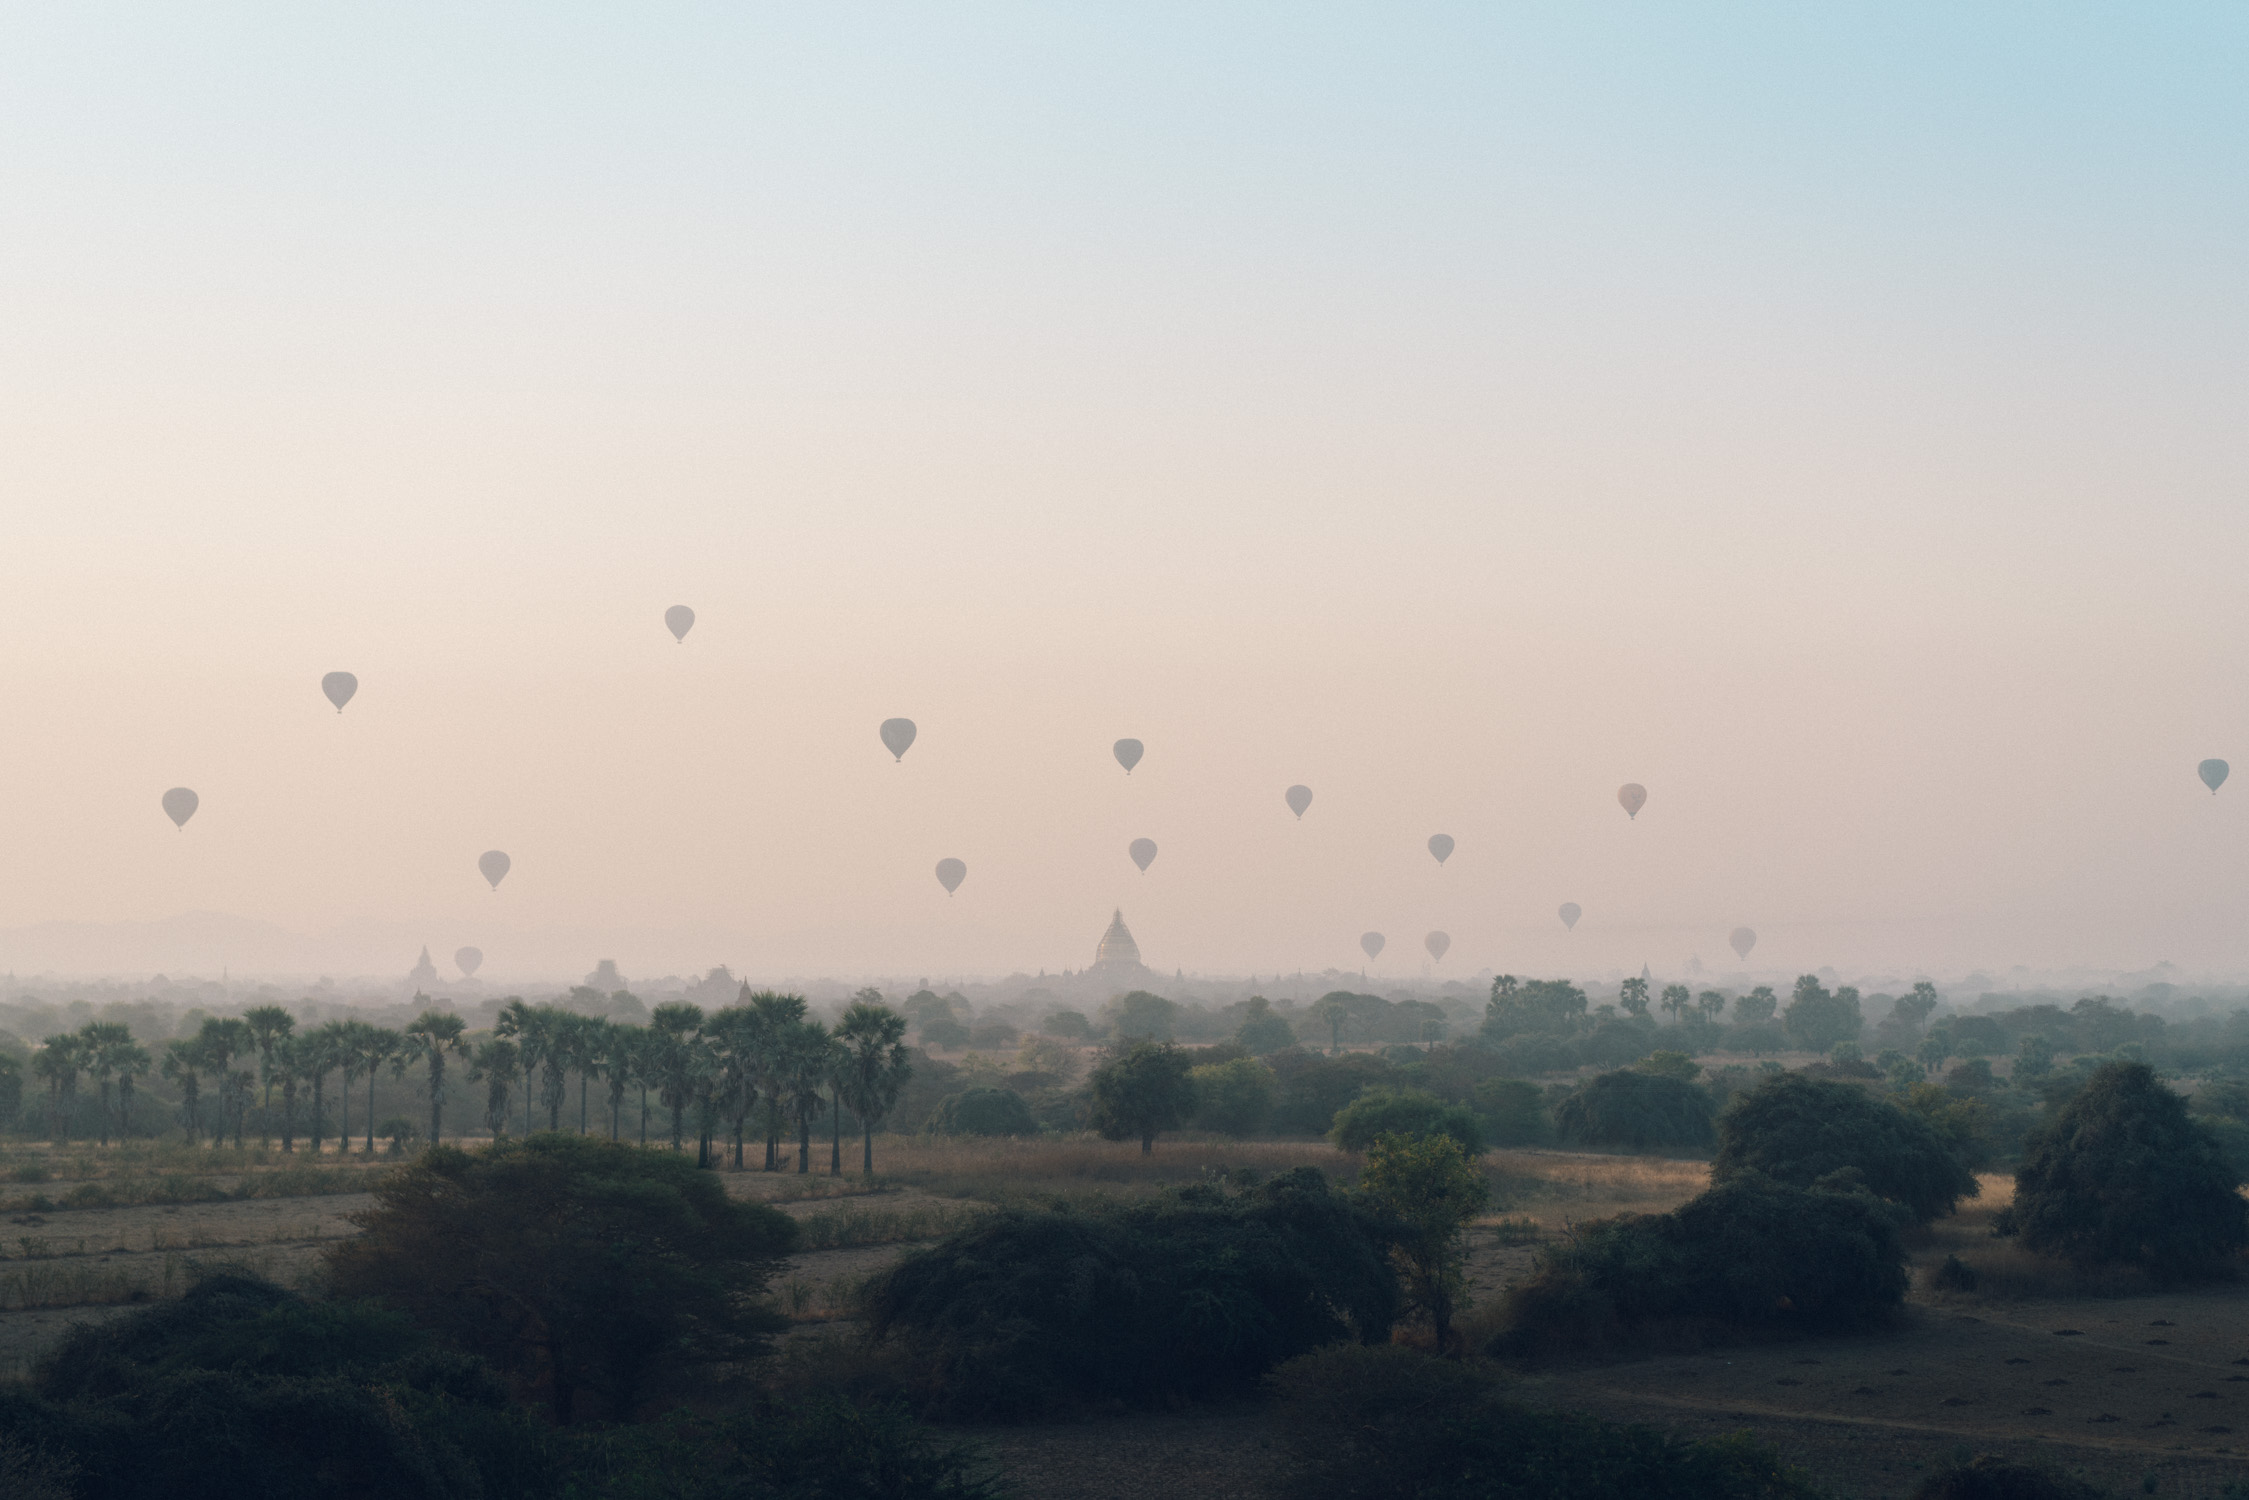 Hot Air Balloon over Bagan